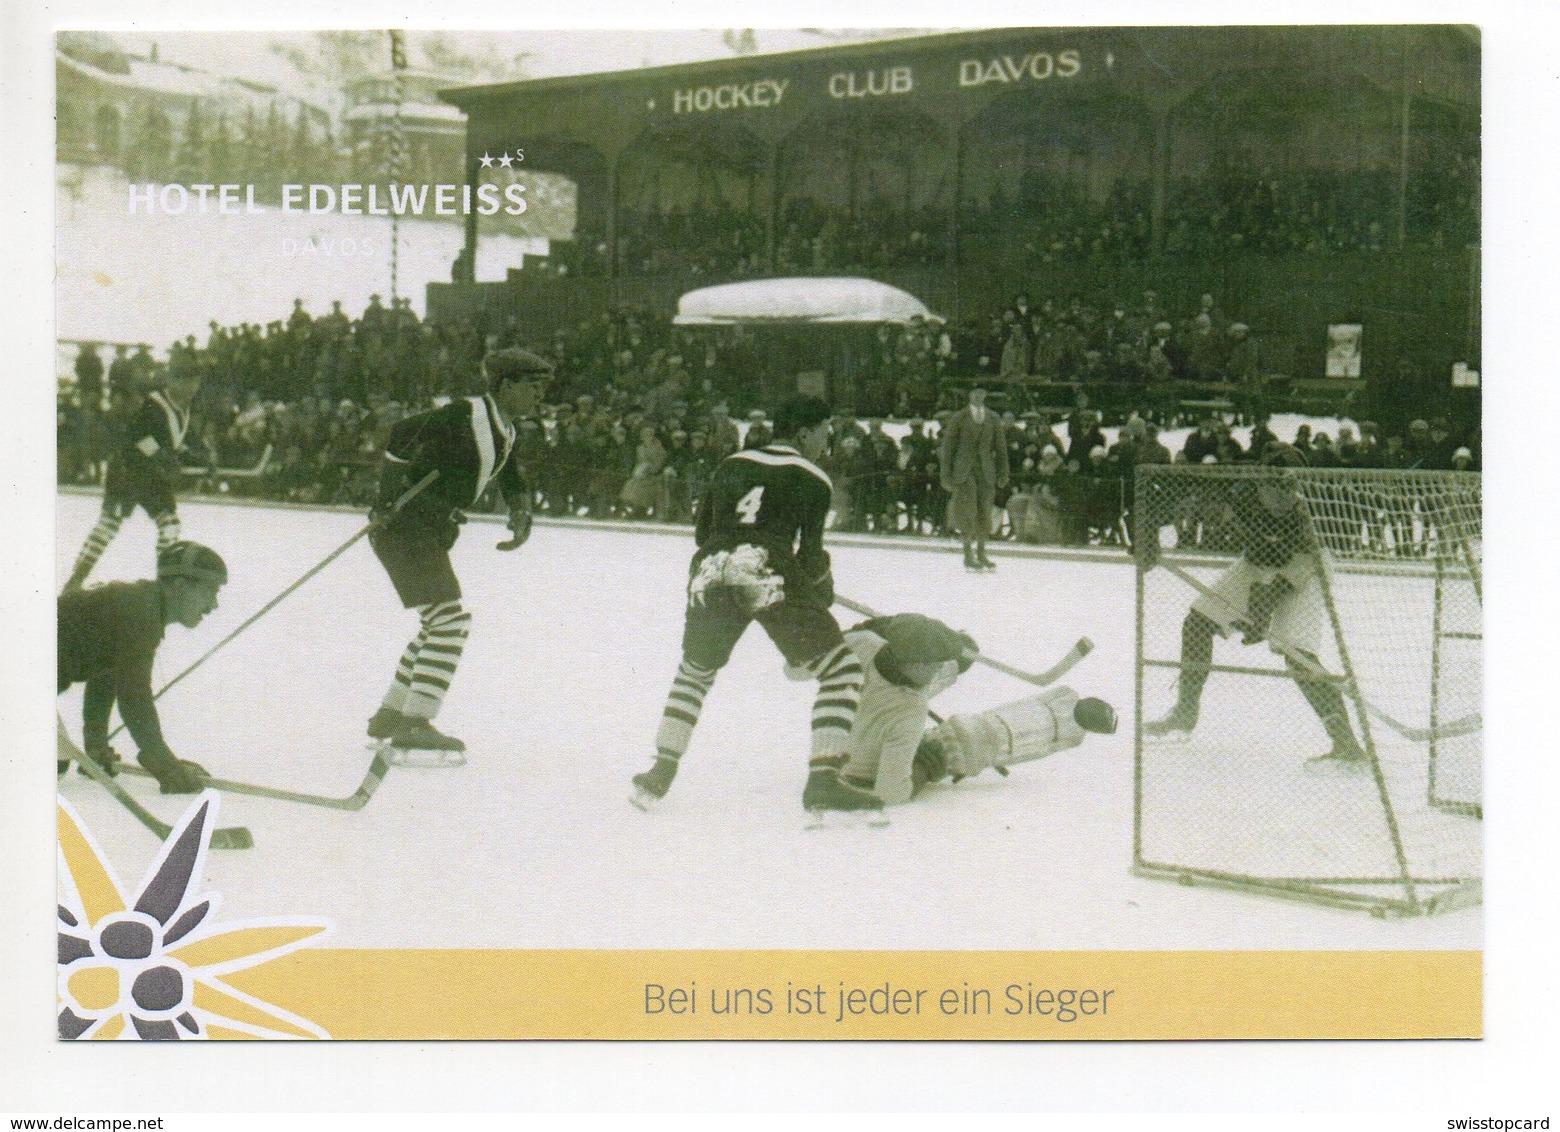 DAVOS Eis-Hockey Club - GR Grisons